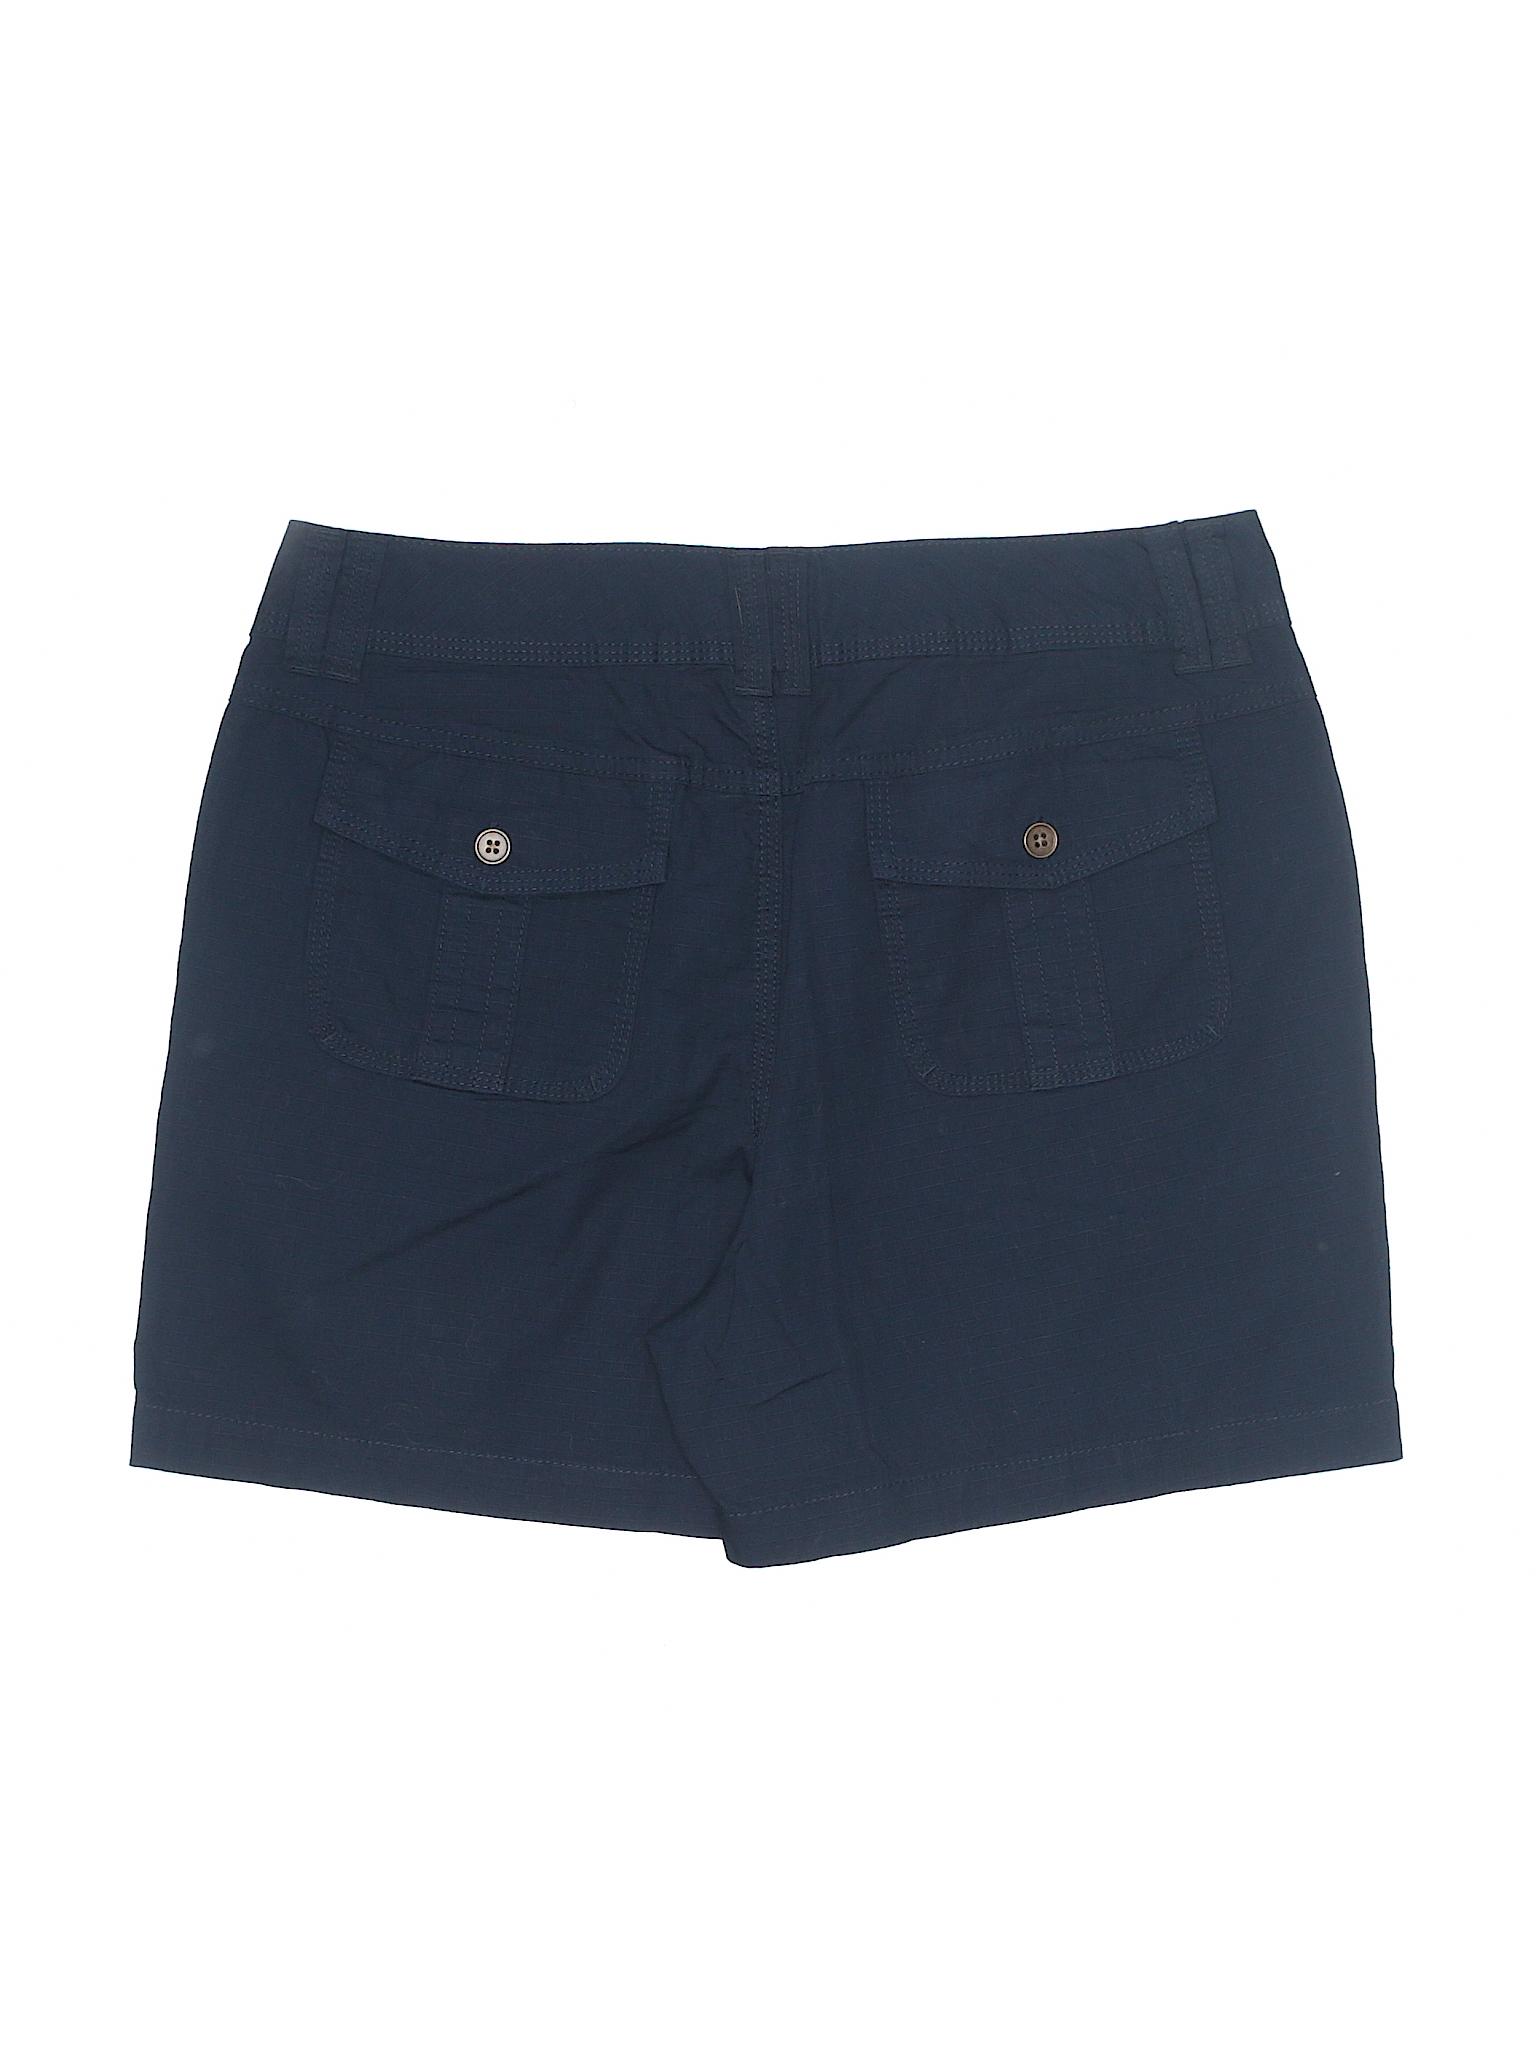 Bay St leisure John's Shorts Boutique Bw6tXBq